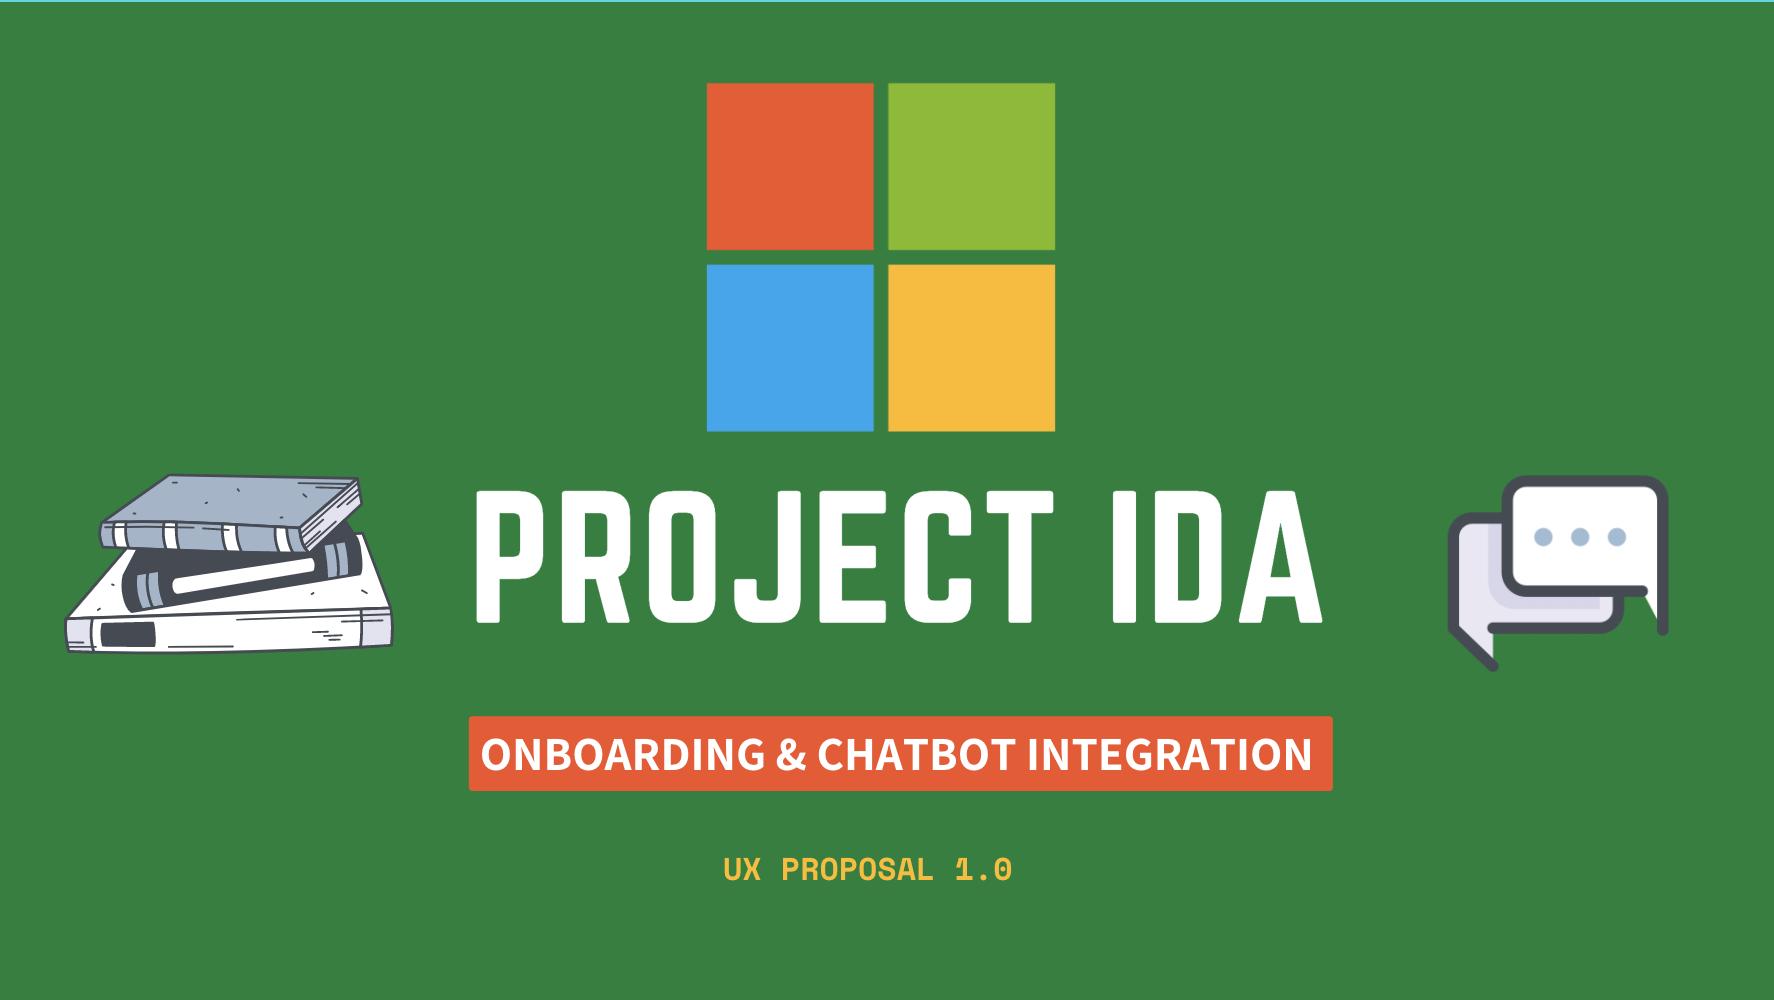 Microsoft Project IDA